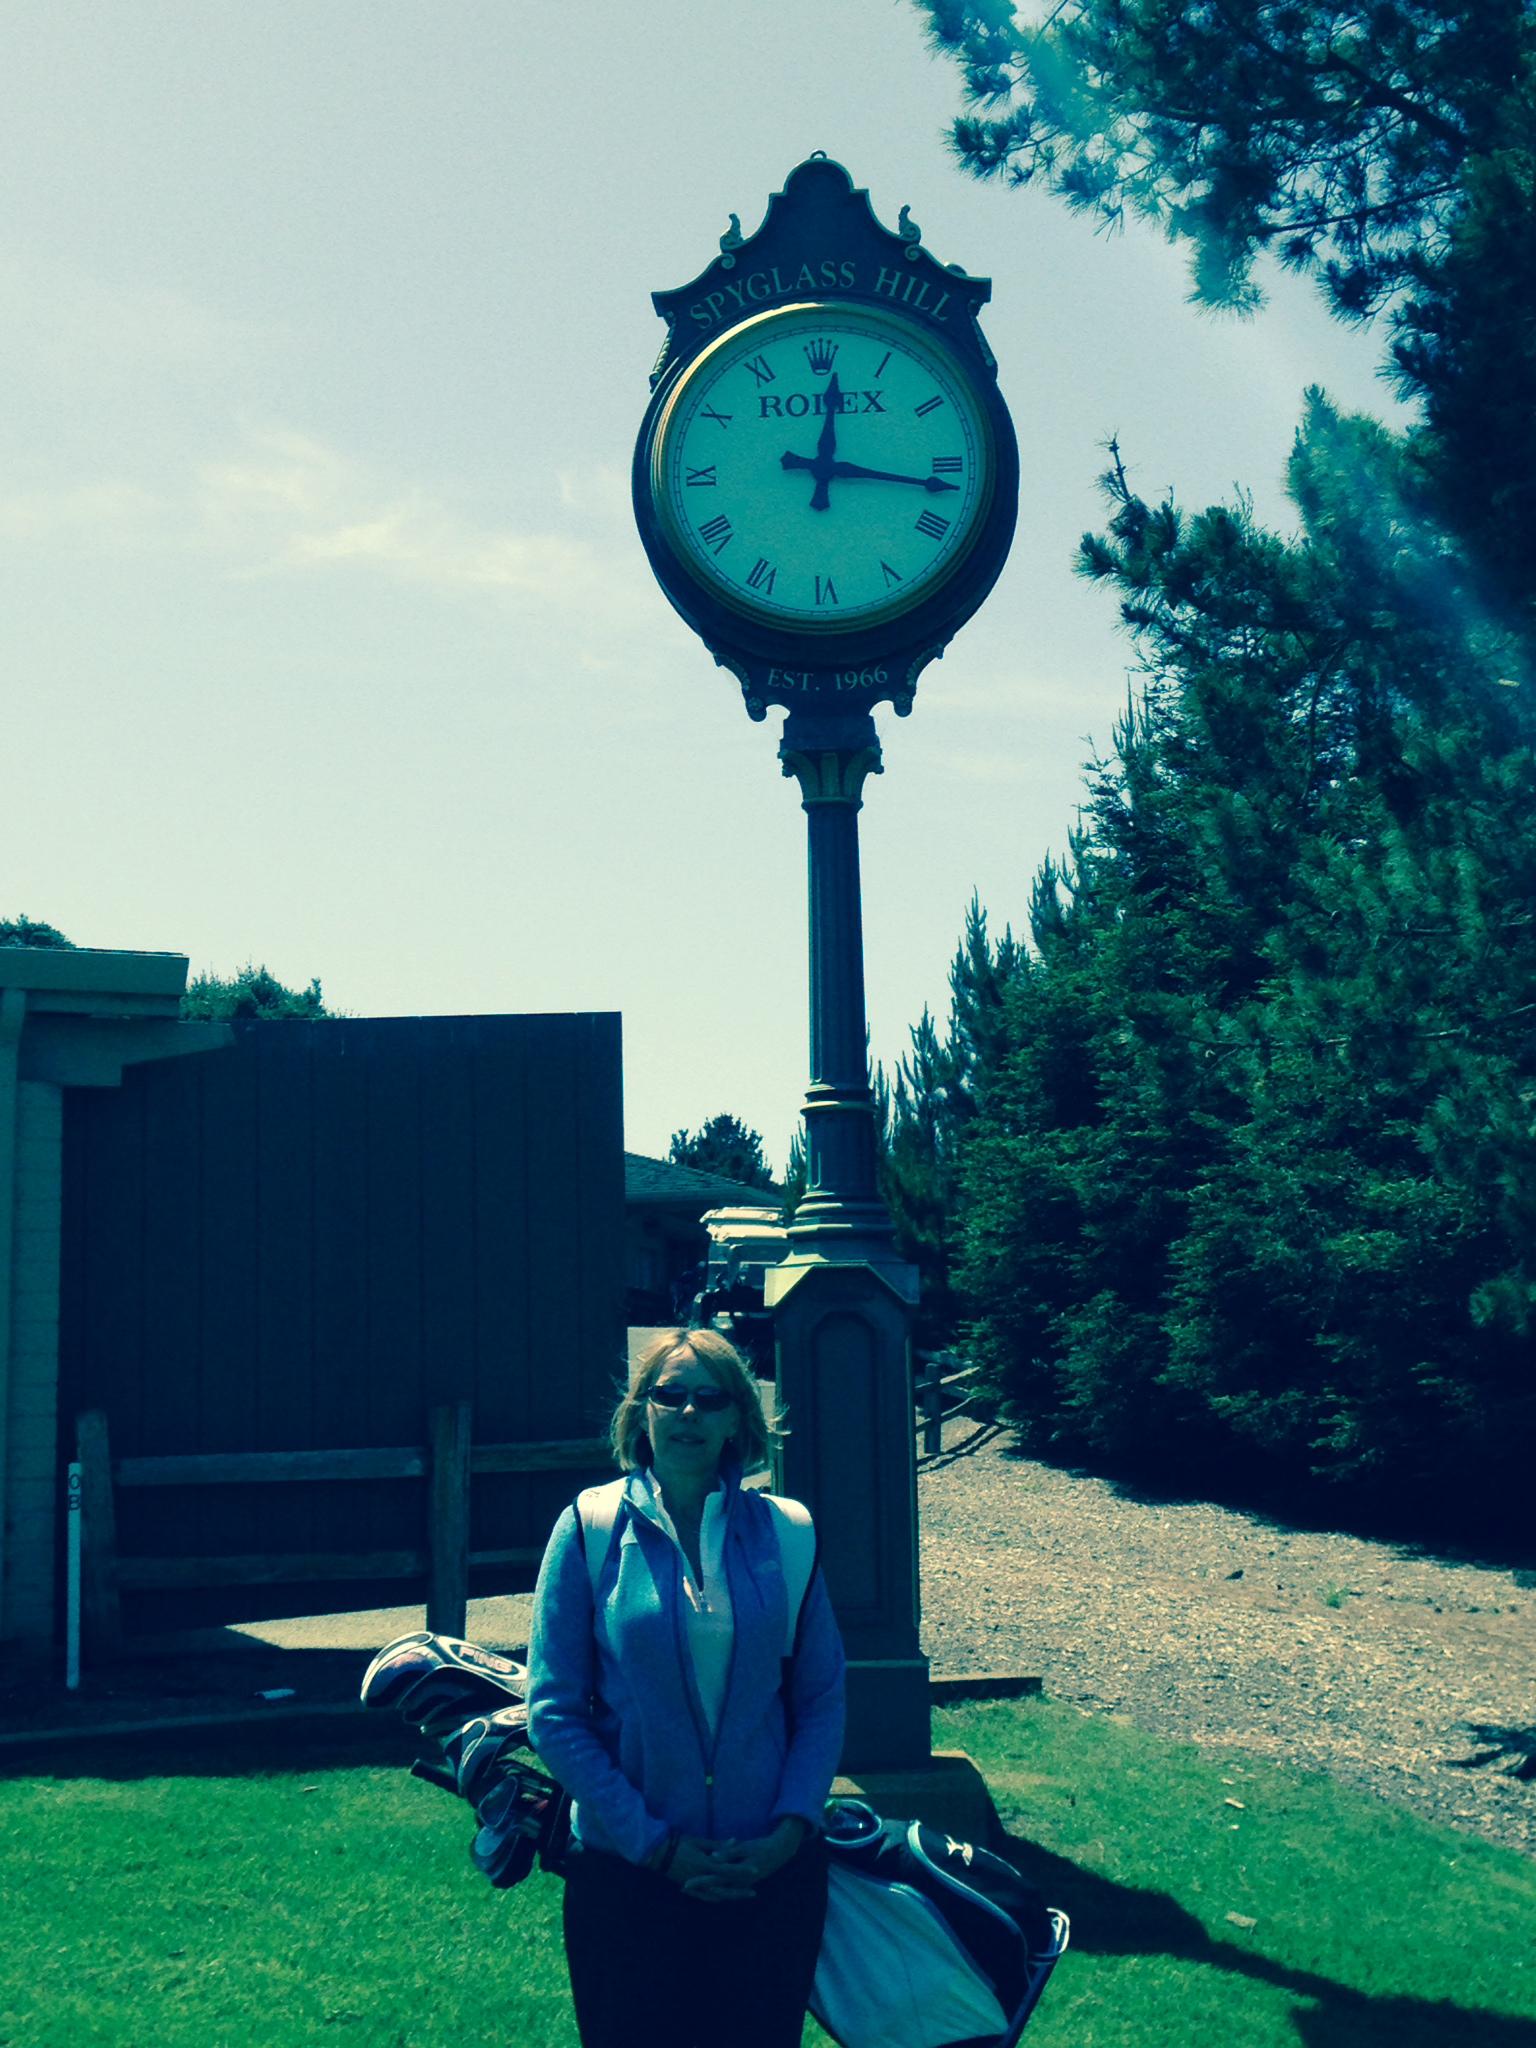 Manda in front of the clock